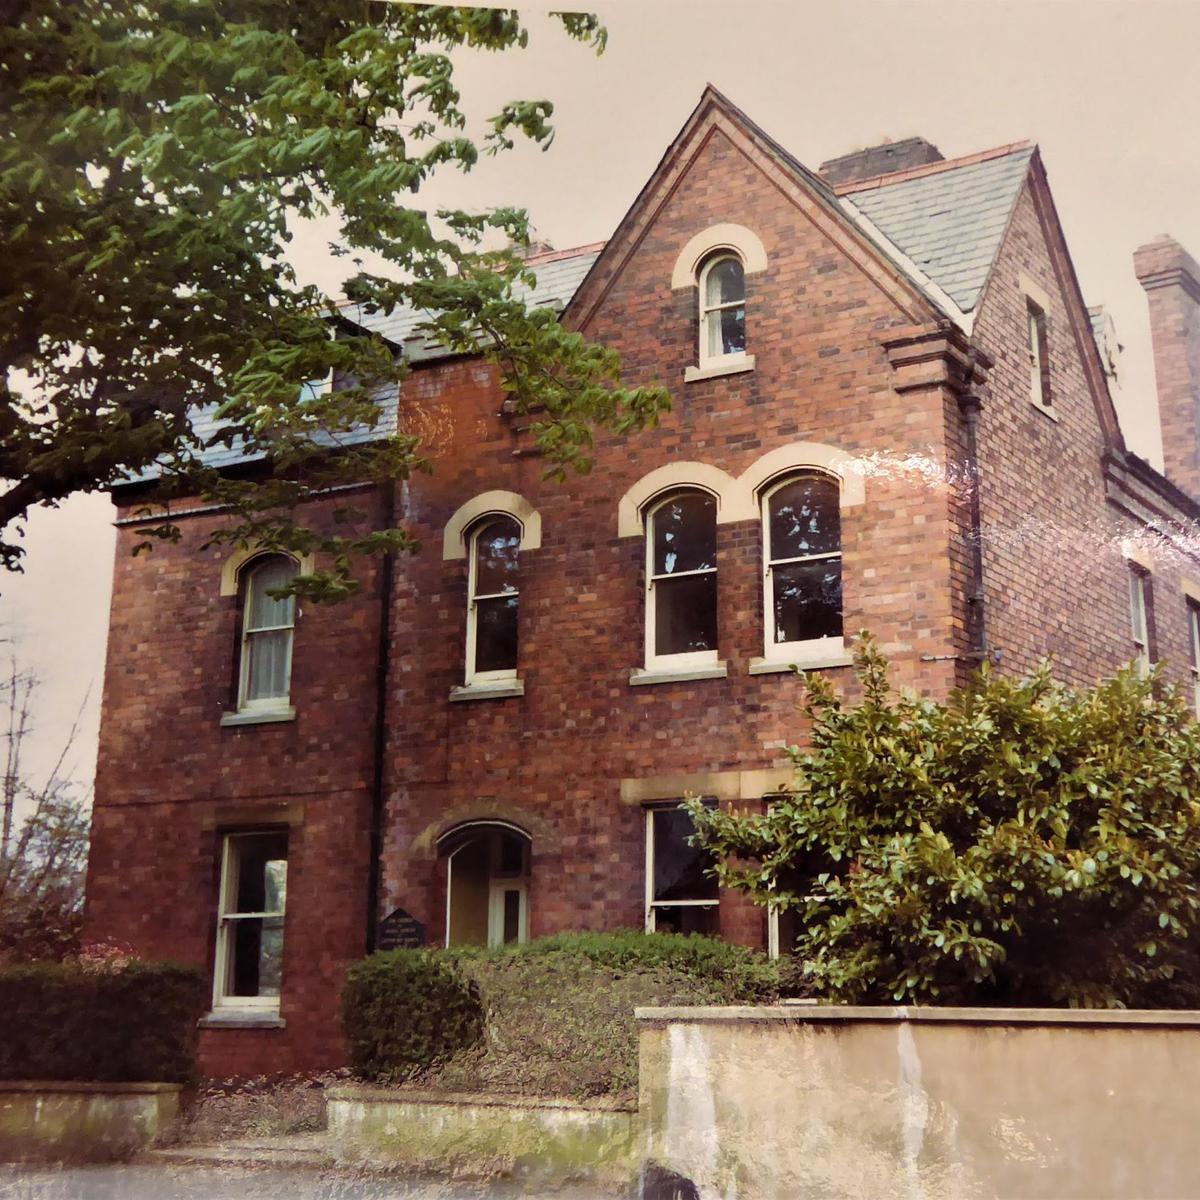 Meeting house in Ridgemont Road